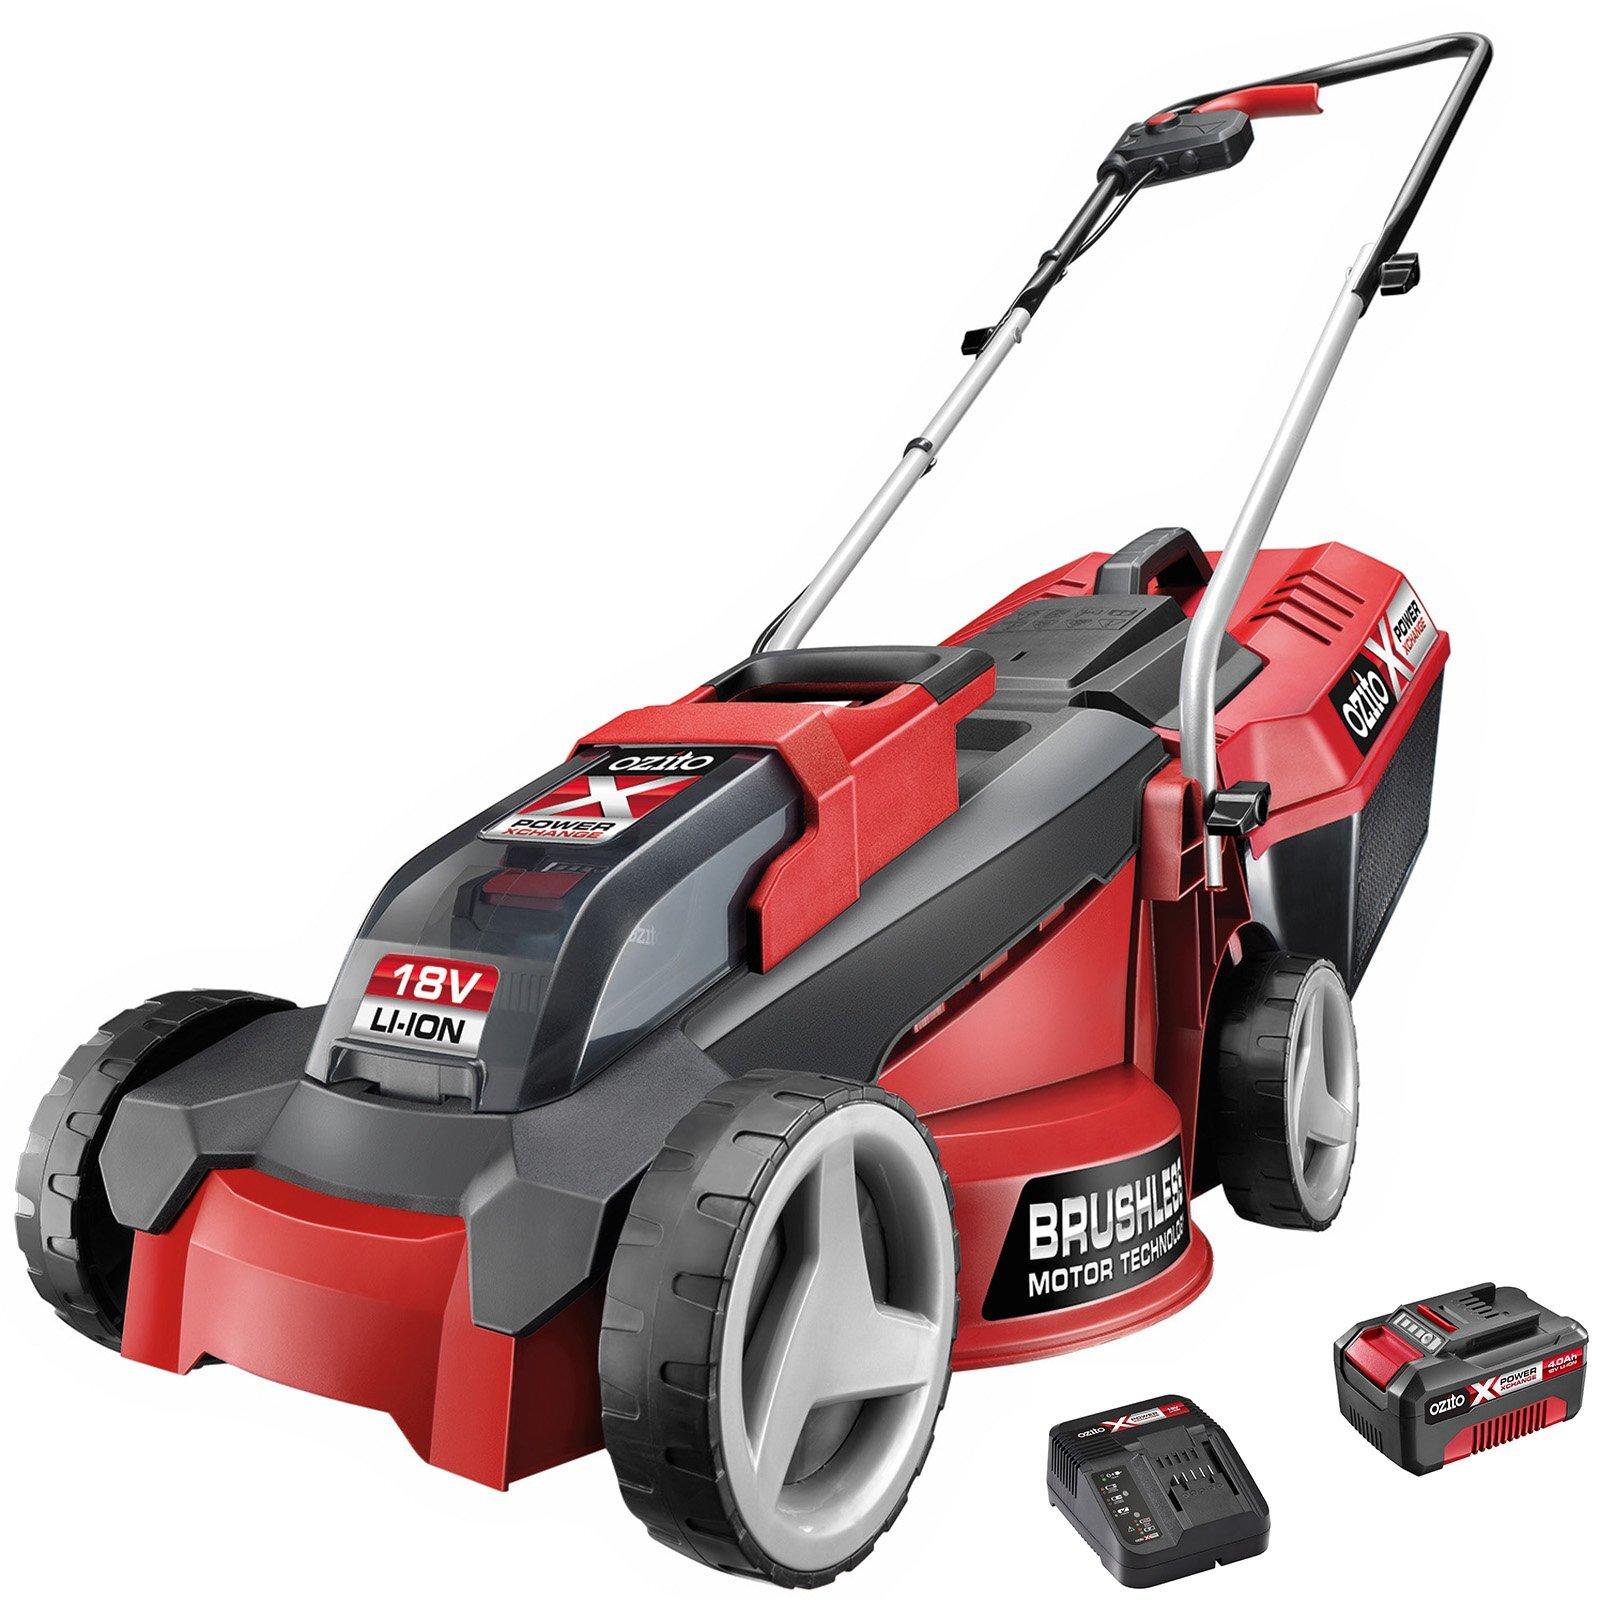 Ozito PXC 18V Brushless Lawn Mower Kit